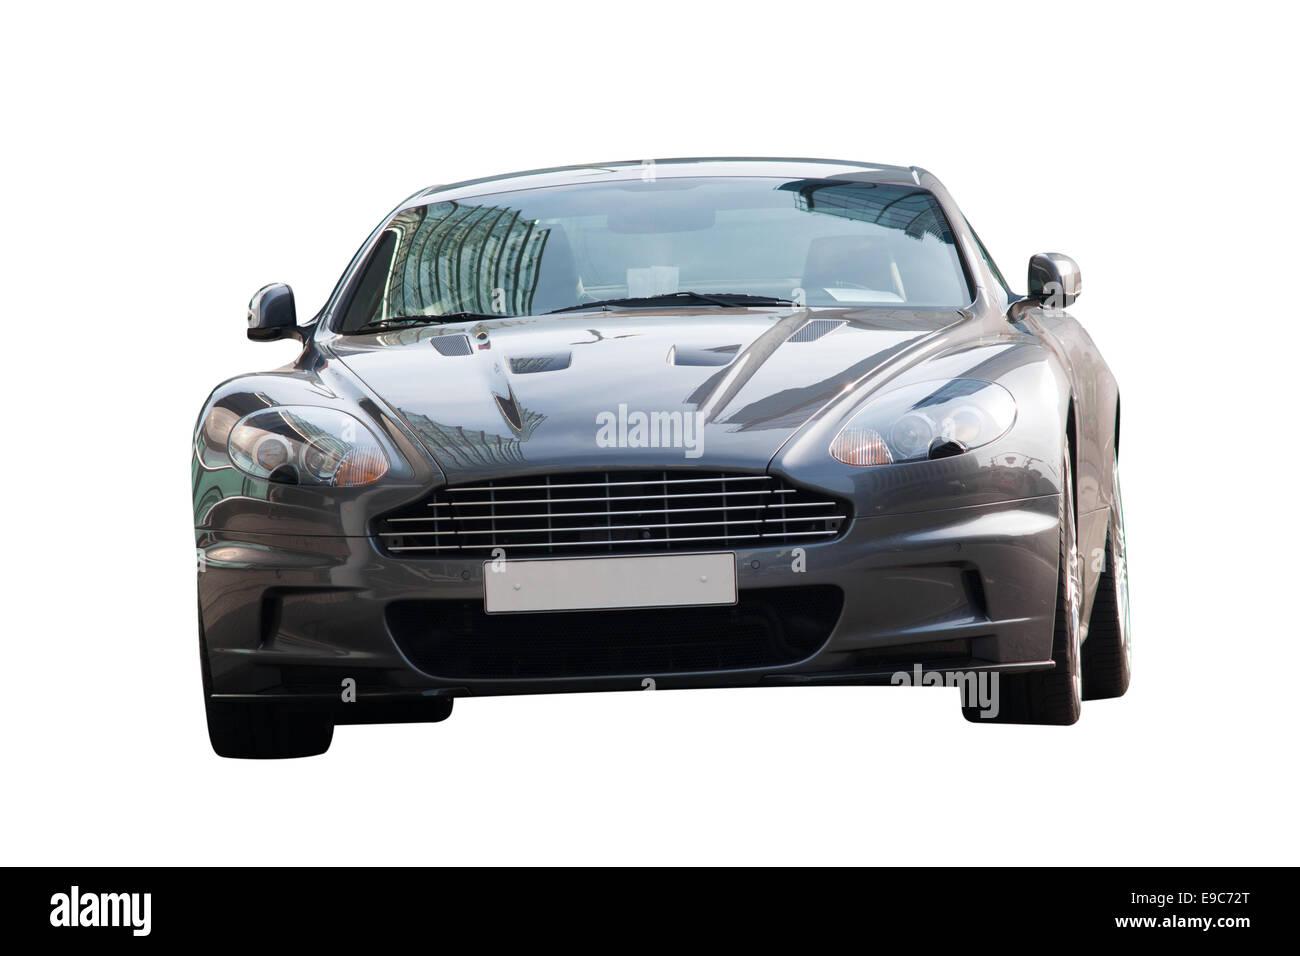 British Sports Car Aston Martin front view - Stock Image